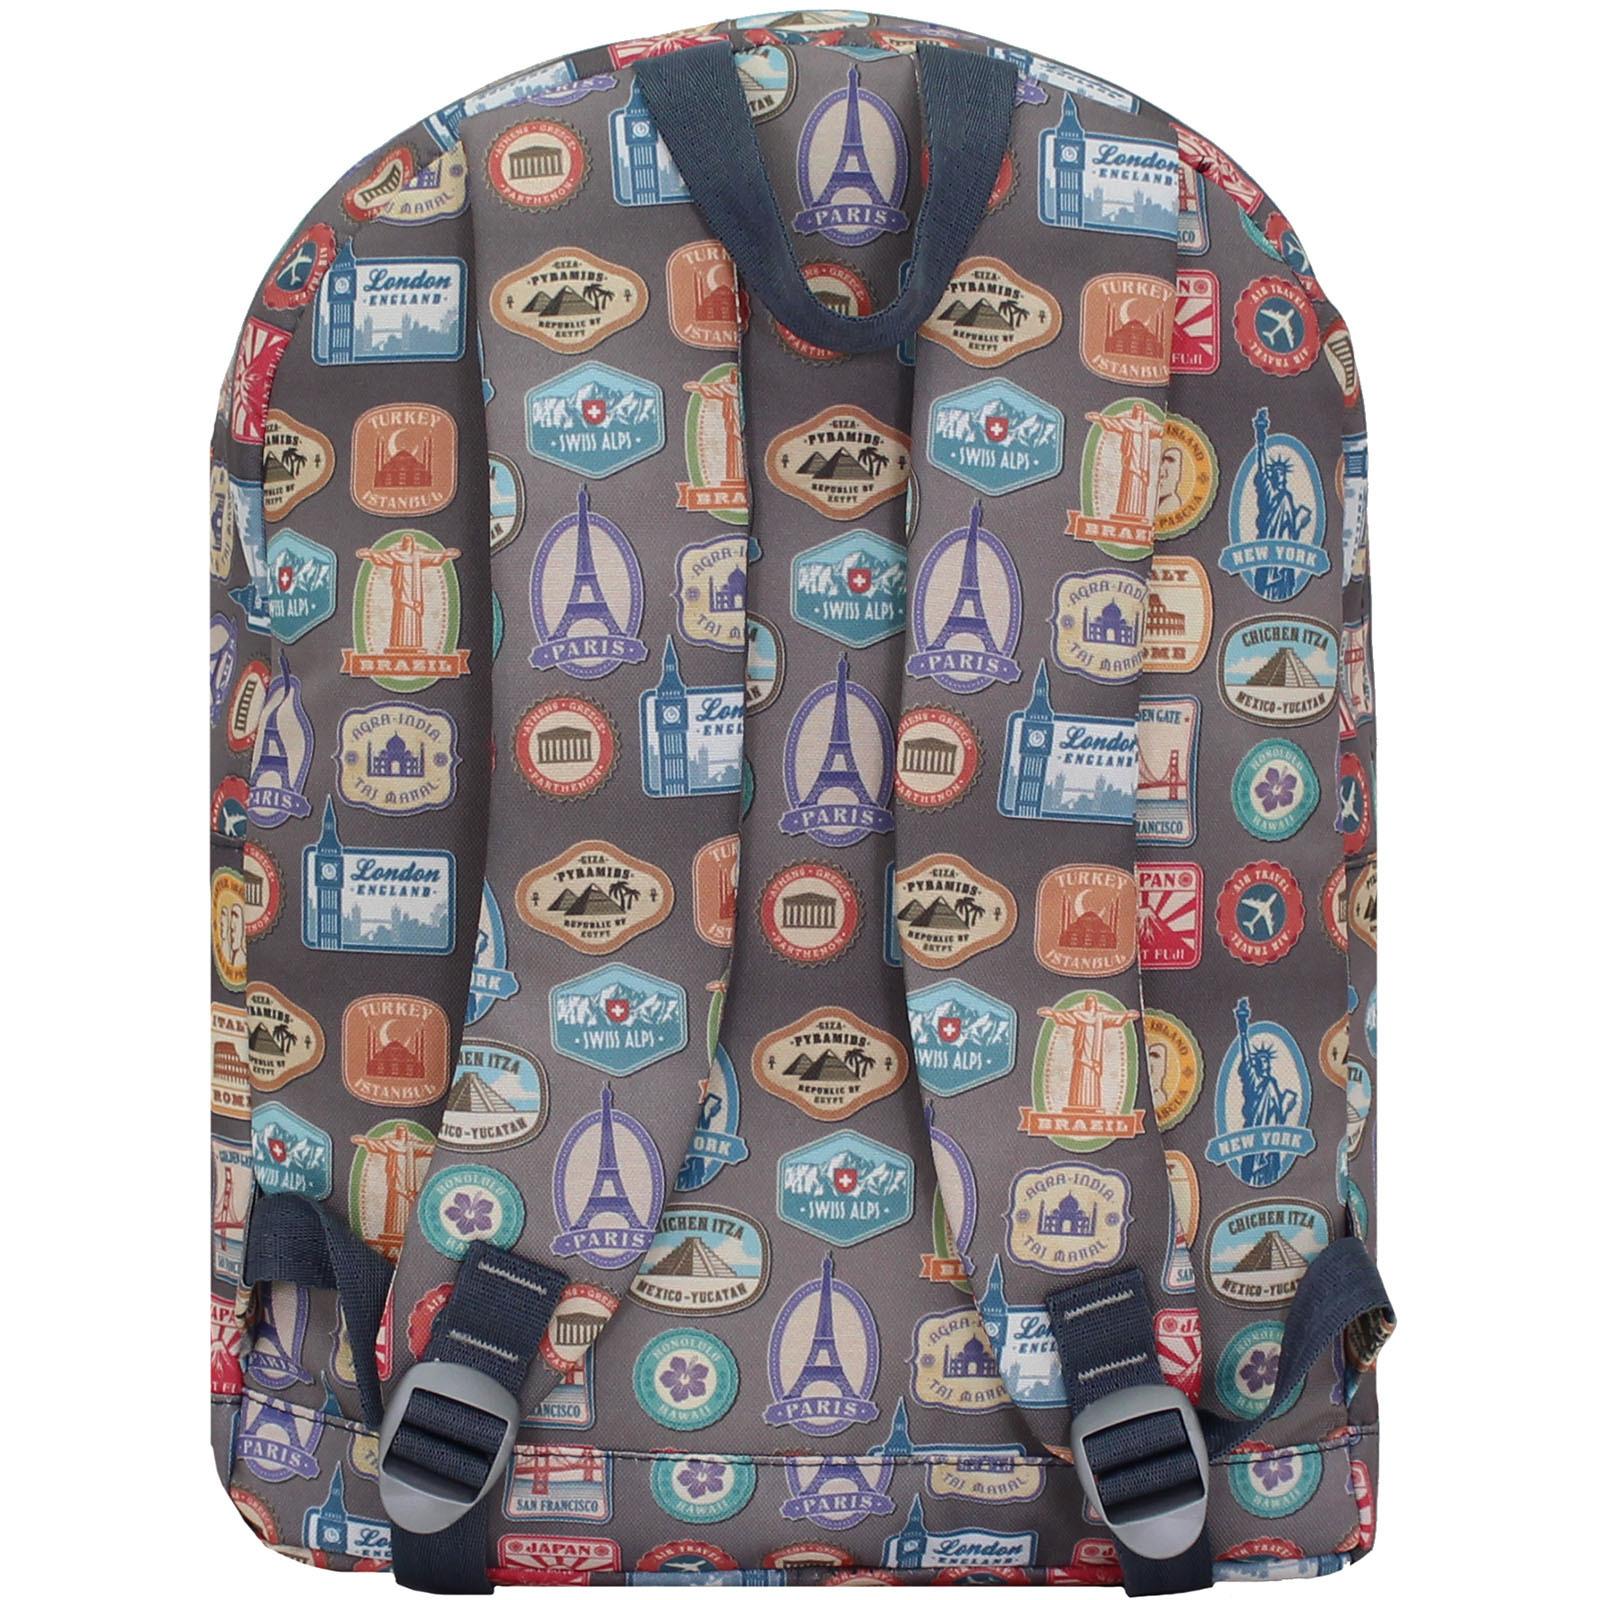 Рюкзак Bagland Молодежный (дизайн) 17 л. сублимация 239 (00533664)